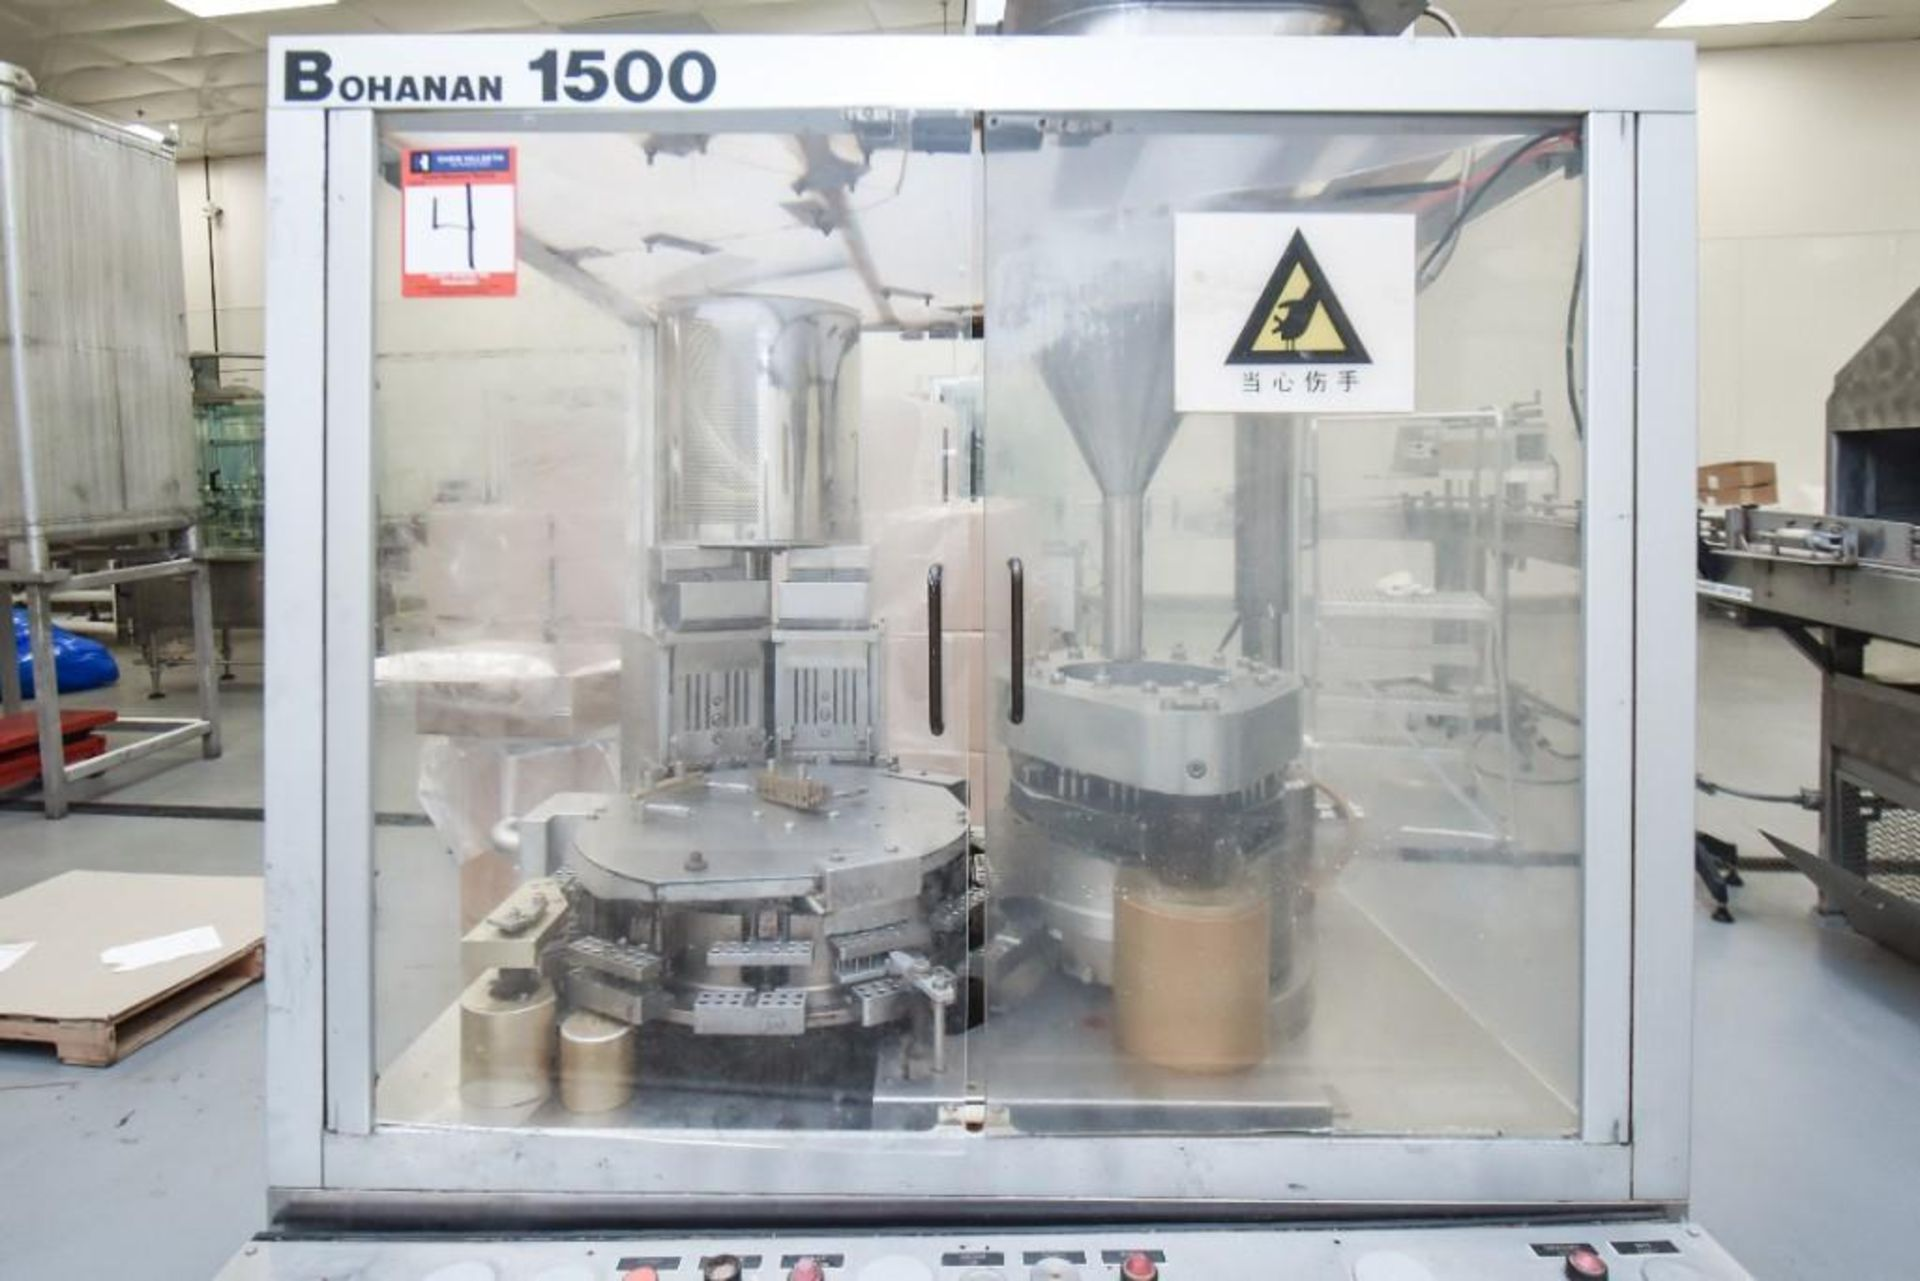 Bohanan 1500 Encapsulation Machine - Image 2 of 13